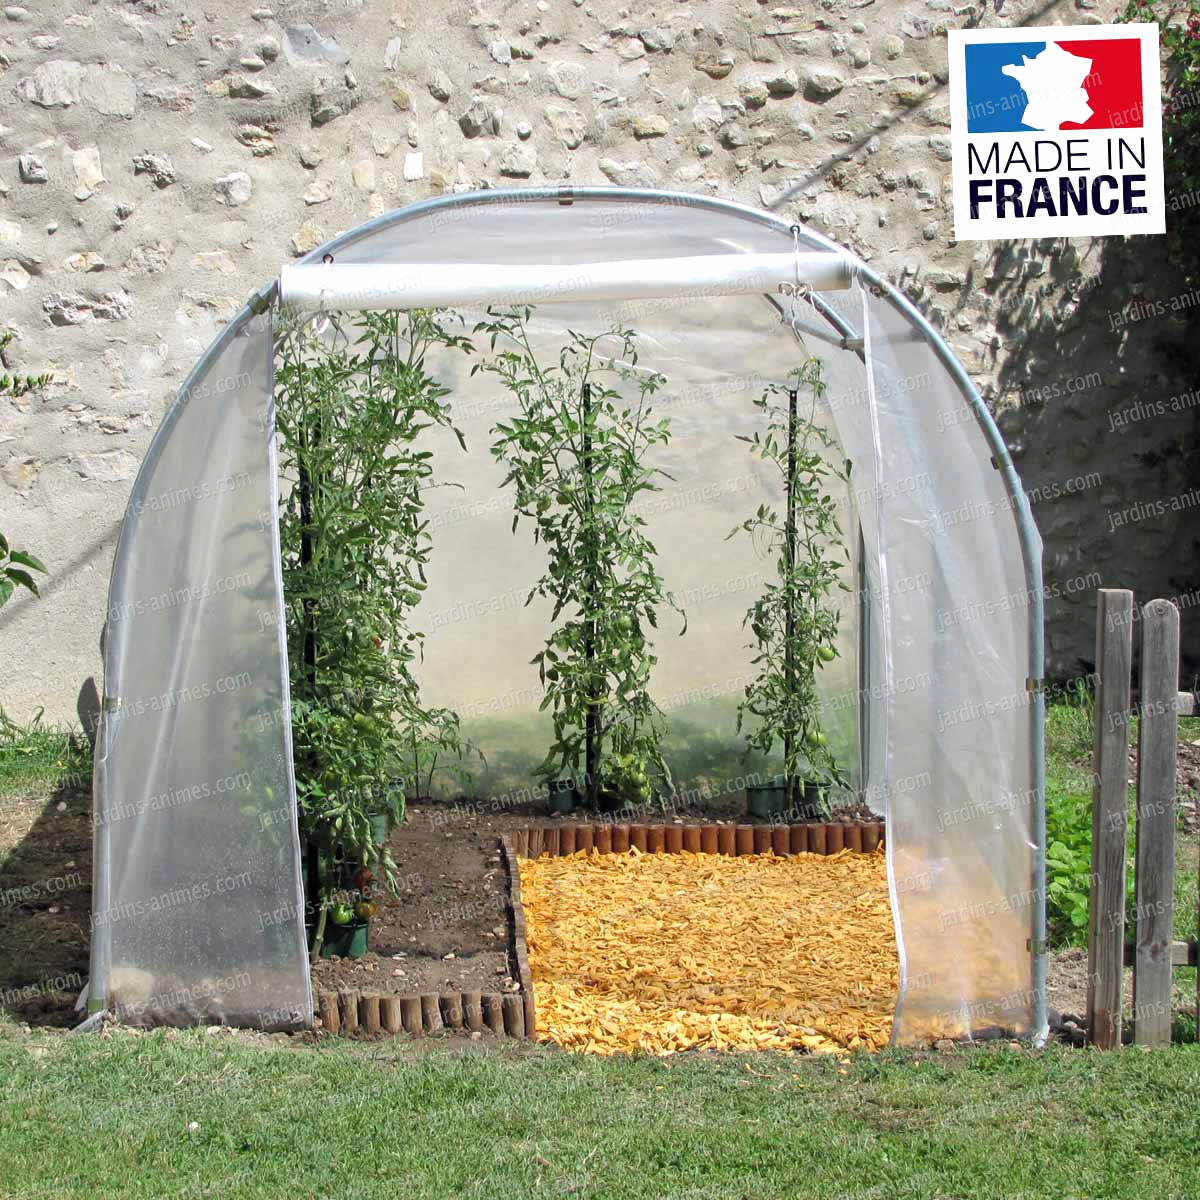 Serres De Gouaix Beau Stock Serre De Jardin Richel élégant Awesome Serre De Jardin Design S